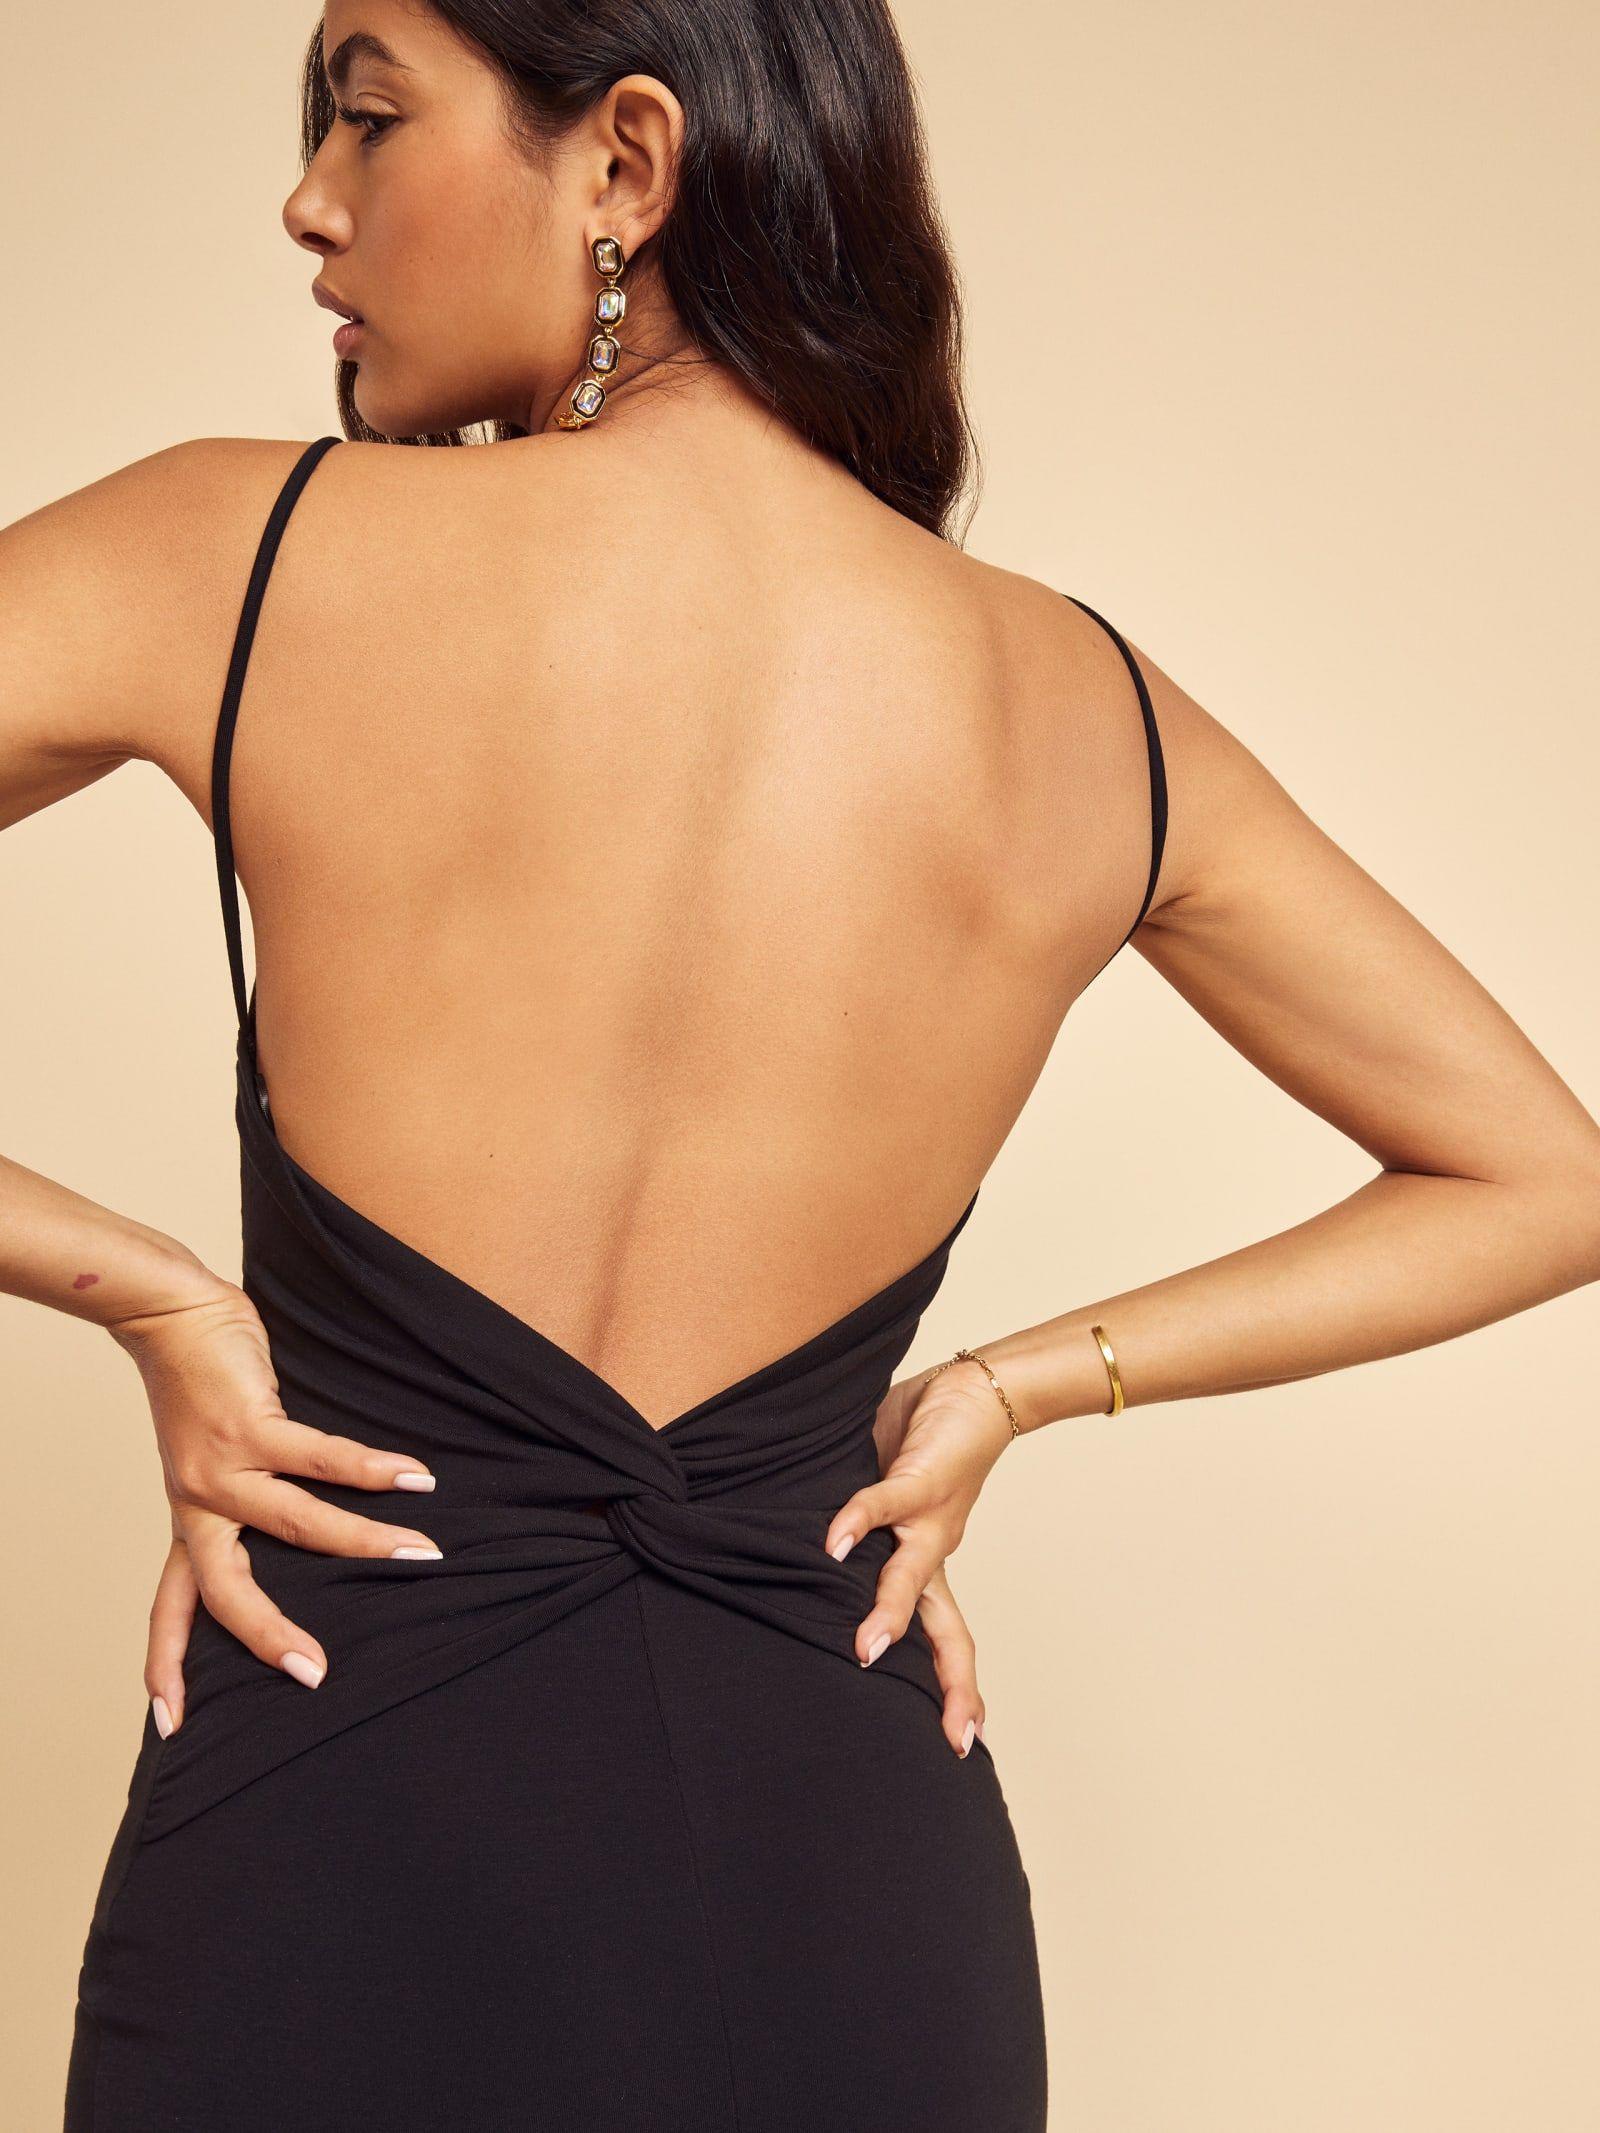 Hex Dress In 2021 Backless Dress Fashion Dresses [ 2133 x 1600 Pixel ]